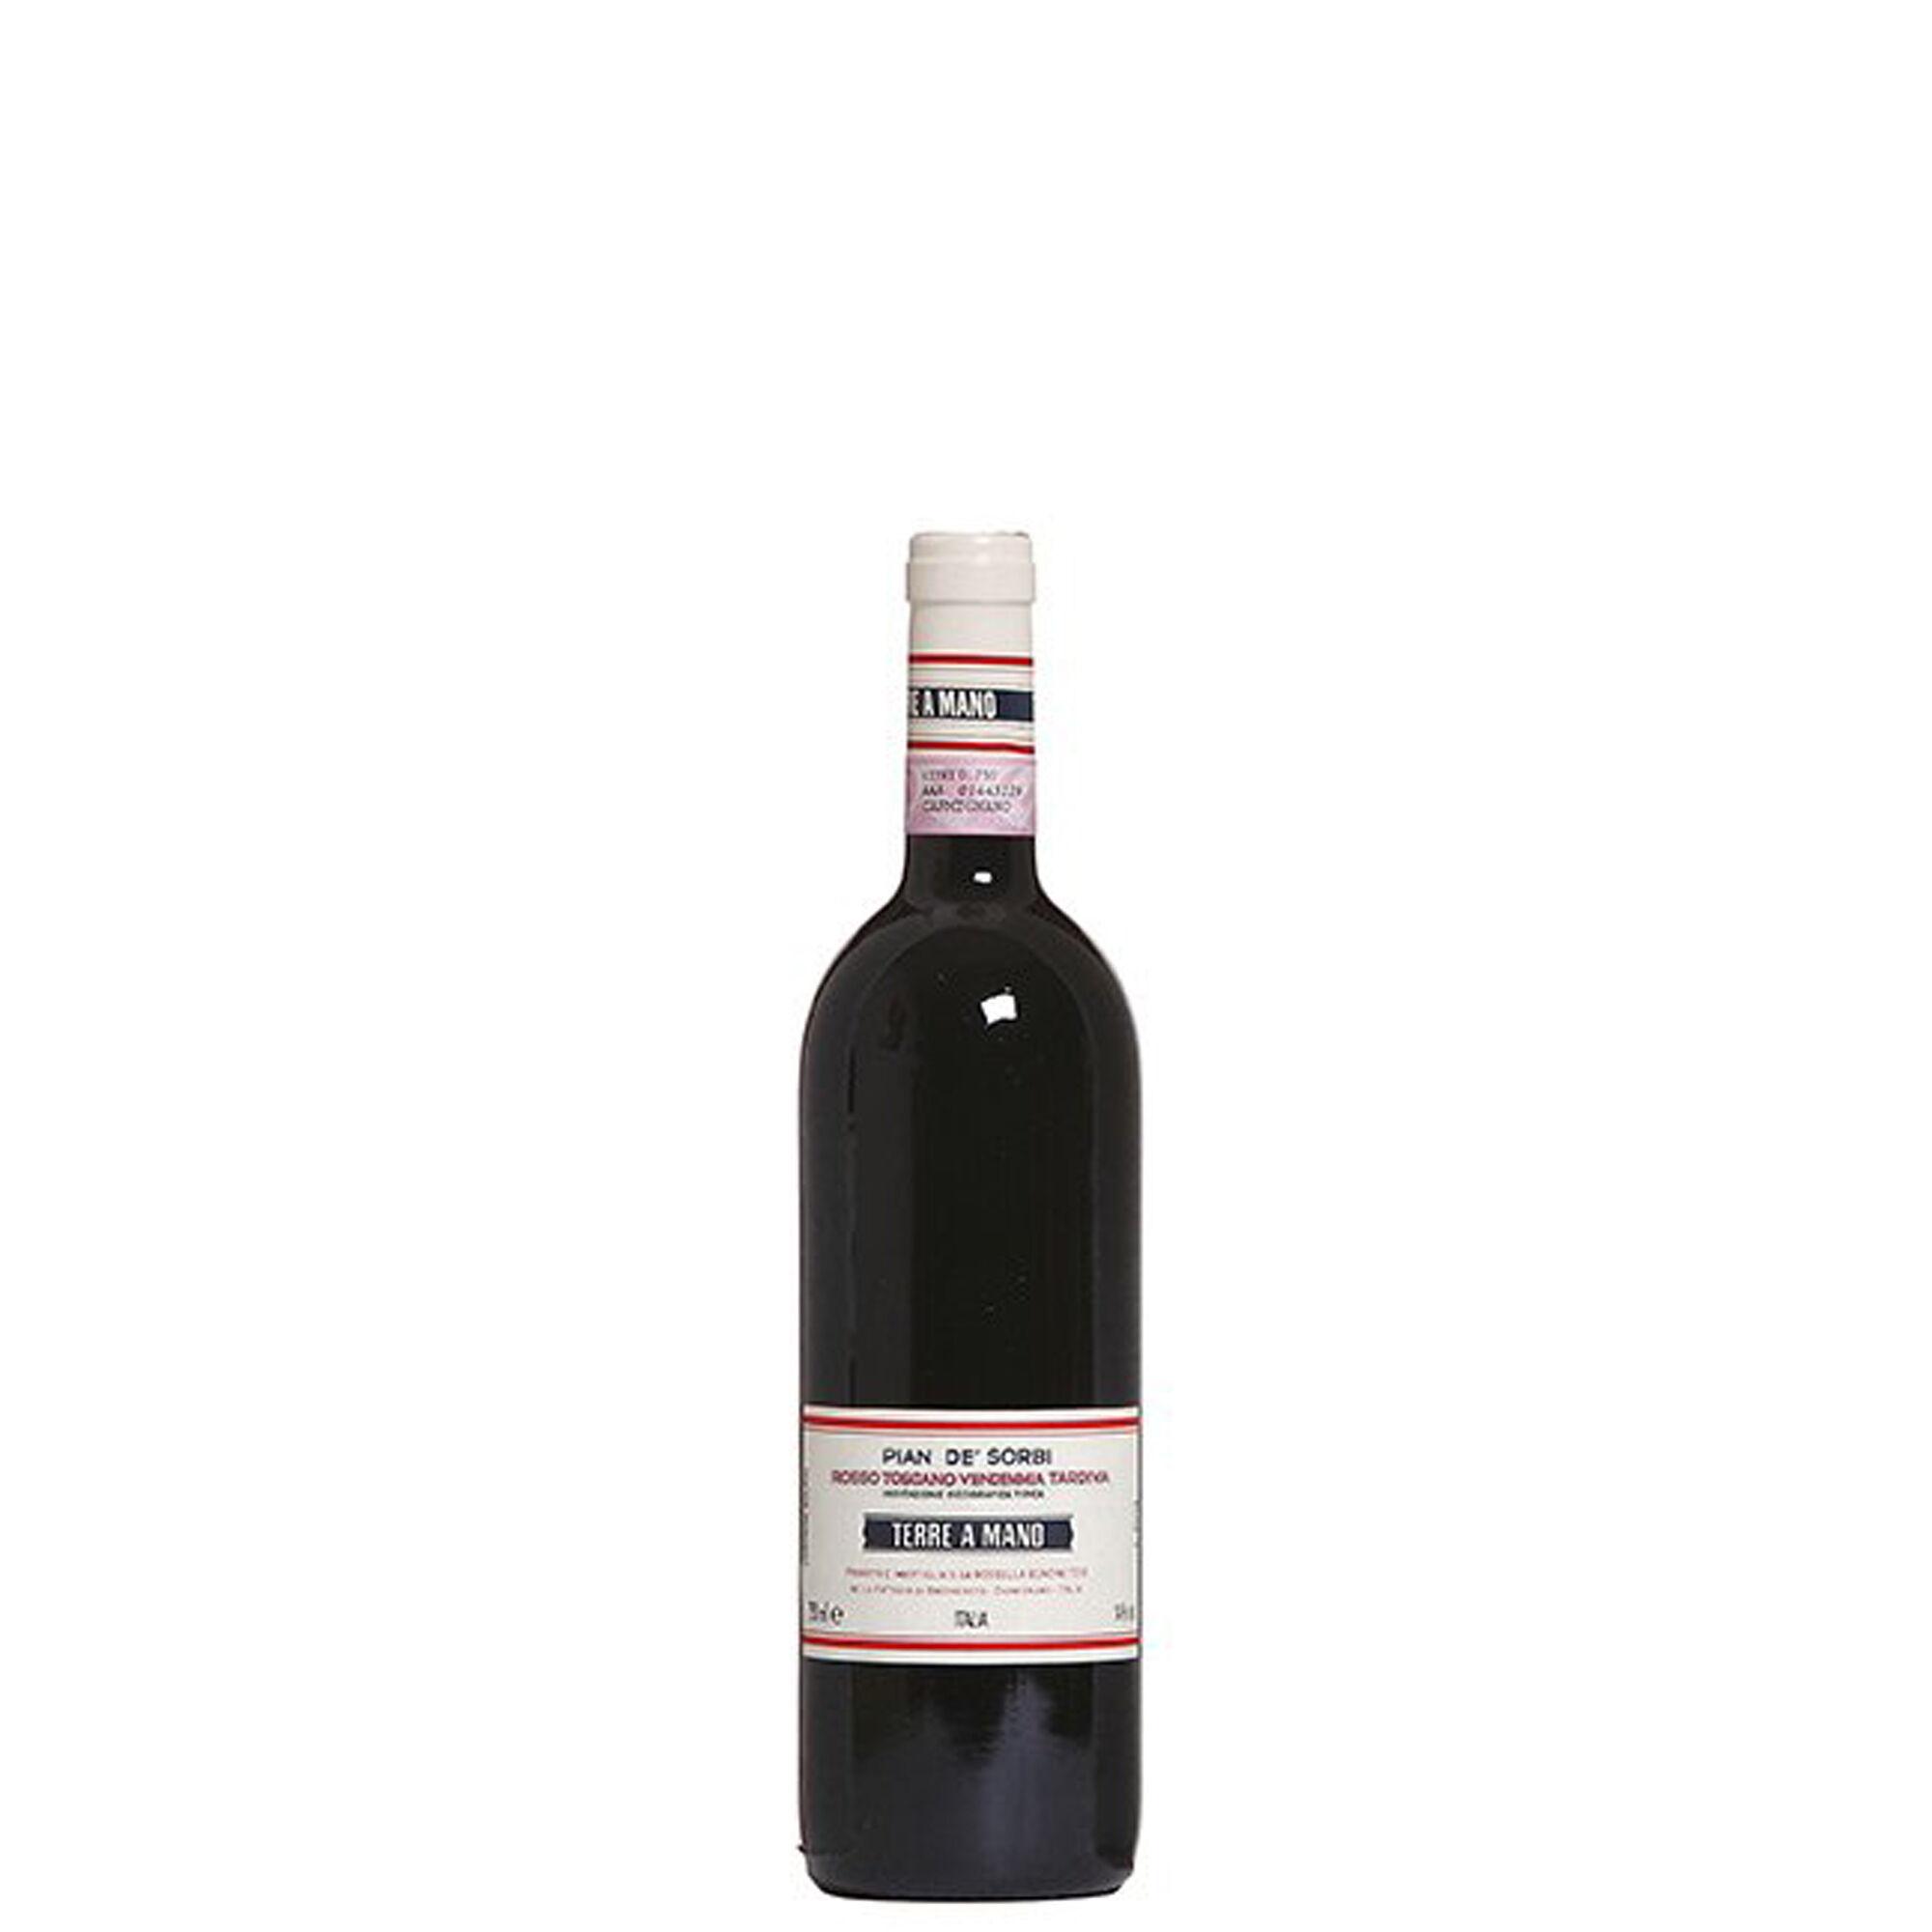 "Terre a Mano Toscana Vendemmia Tardiva Igt ""pian De Sorbi"" 2011"